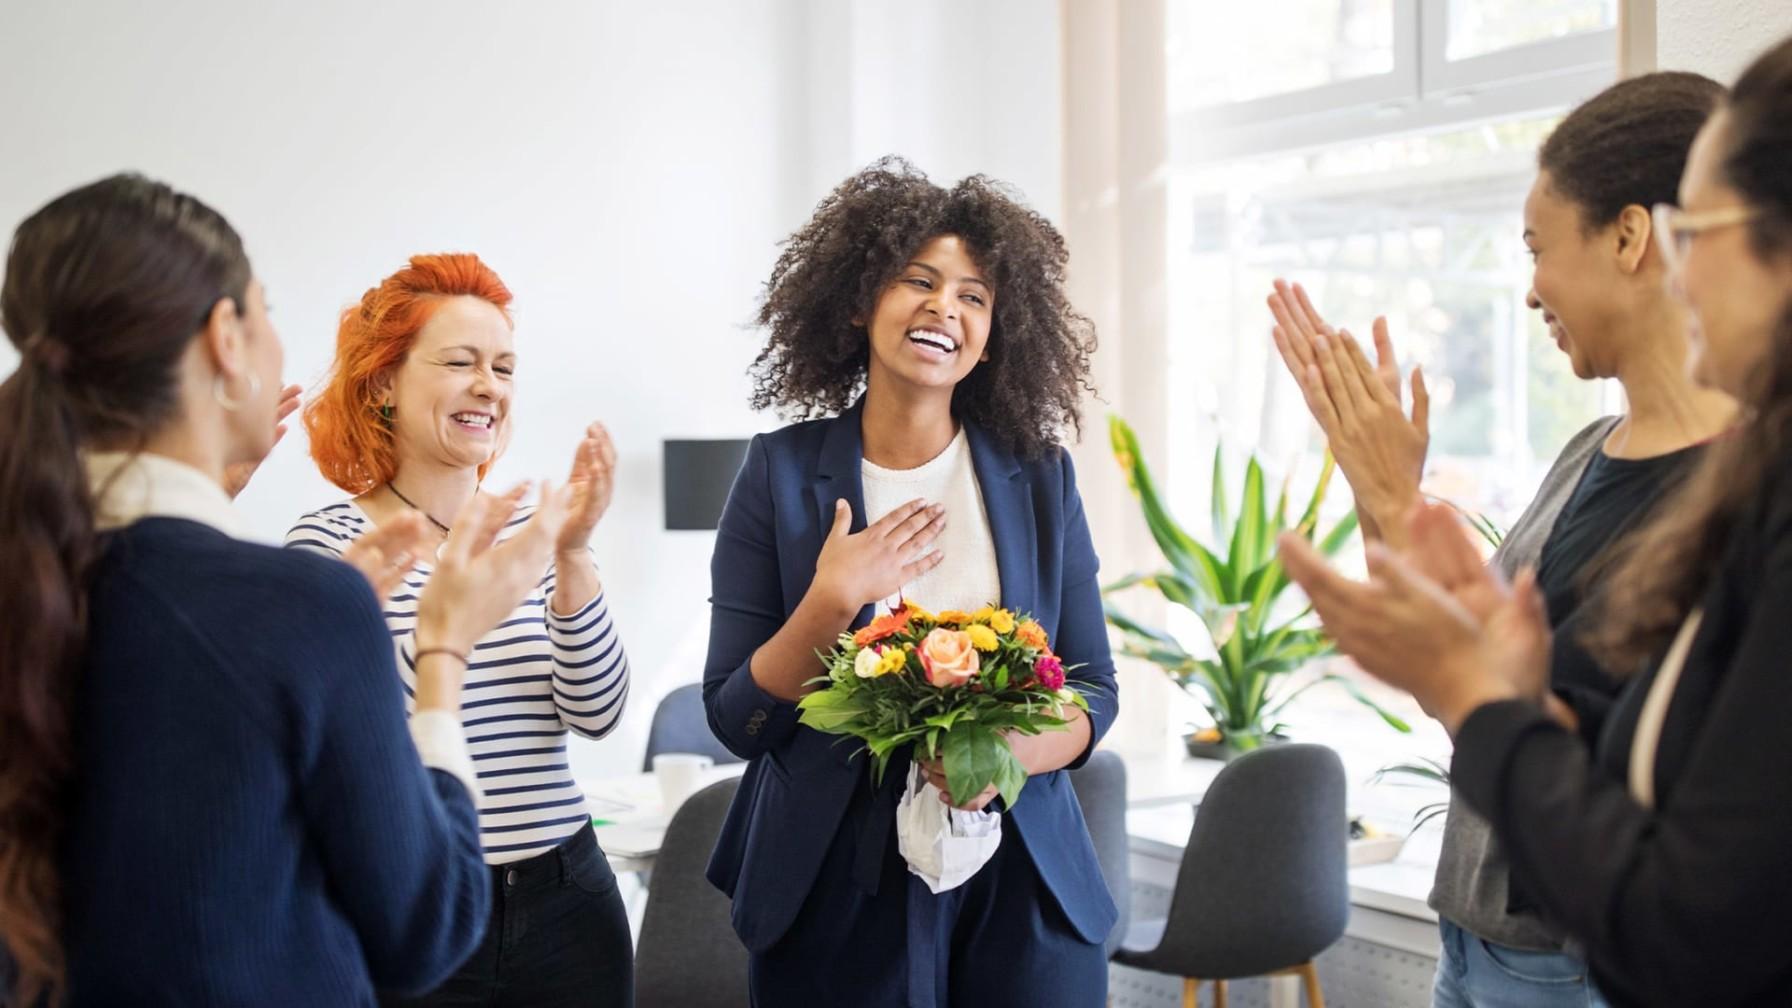 celebrating success of an employee